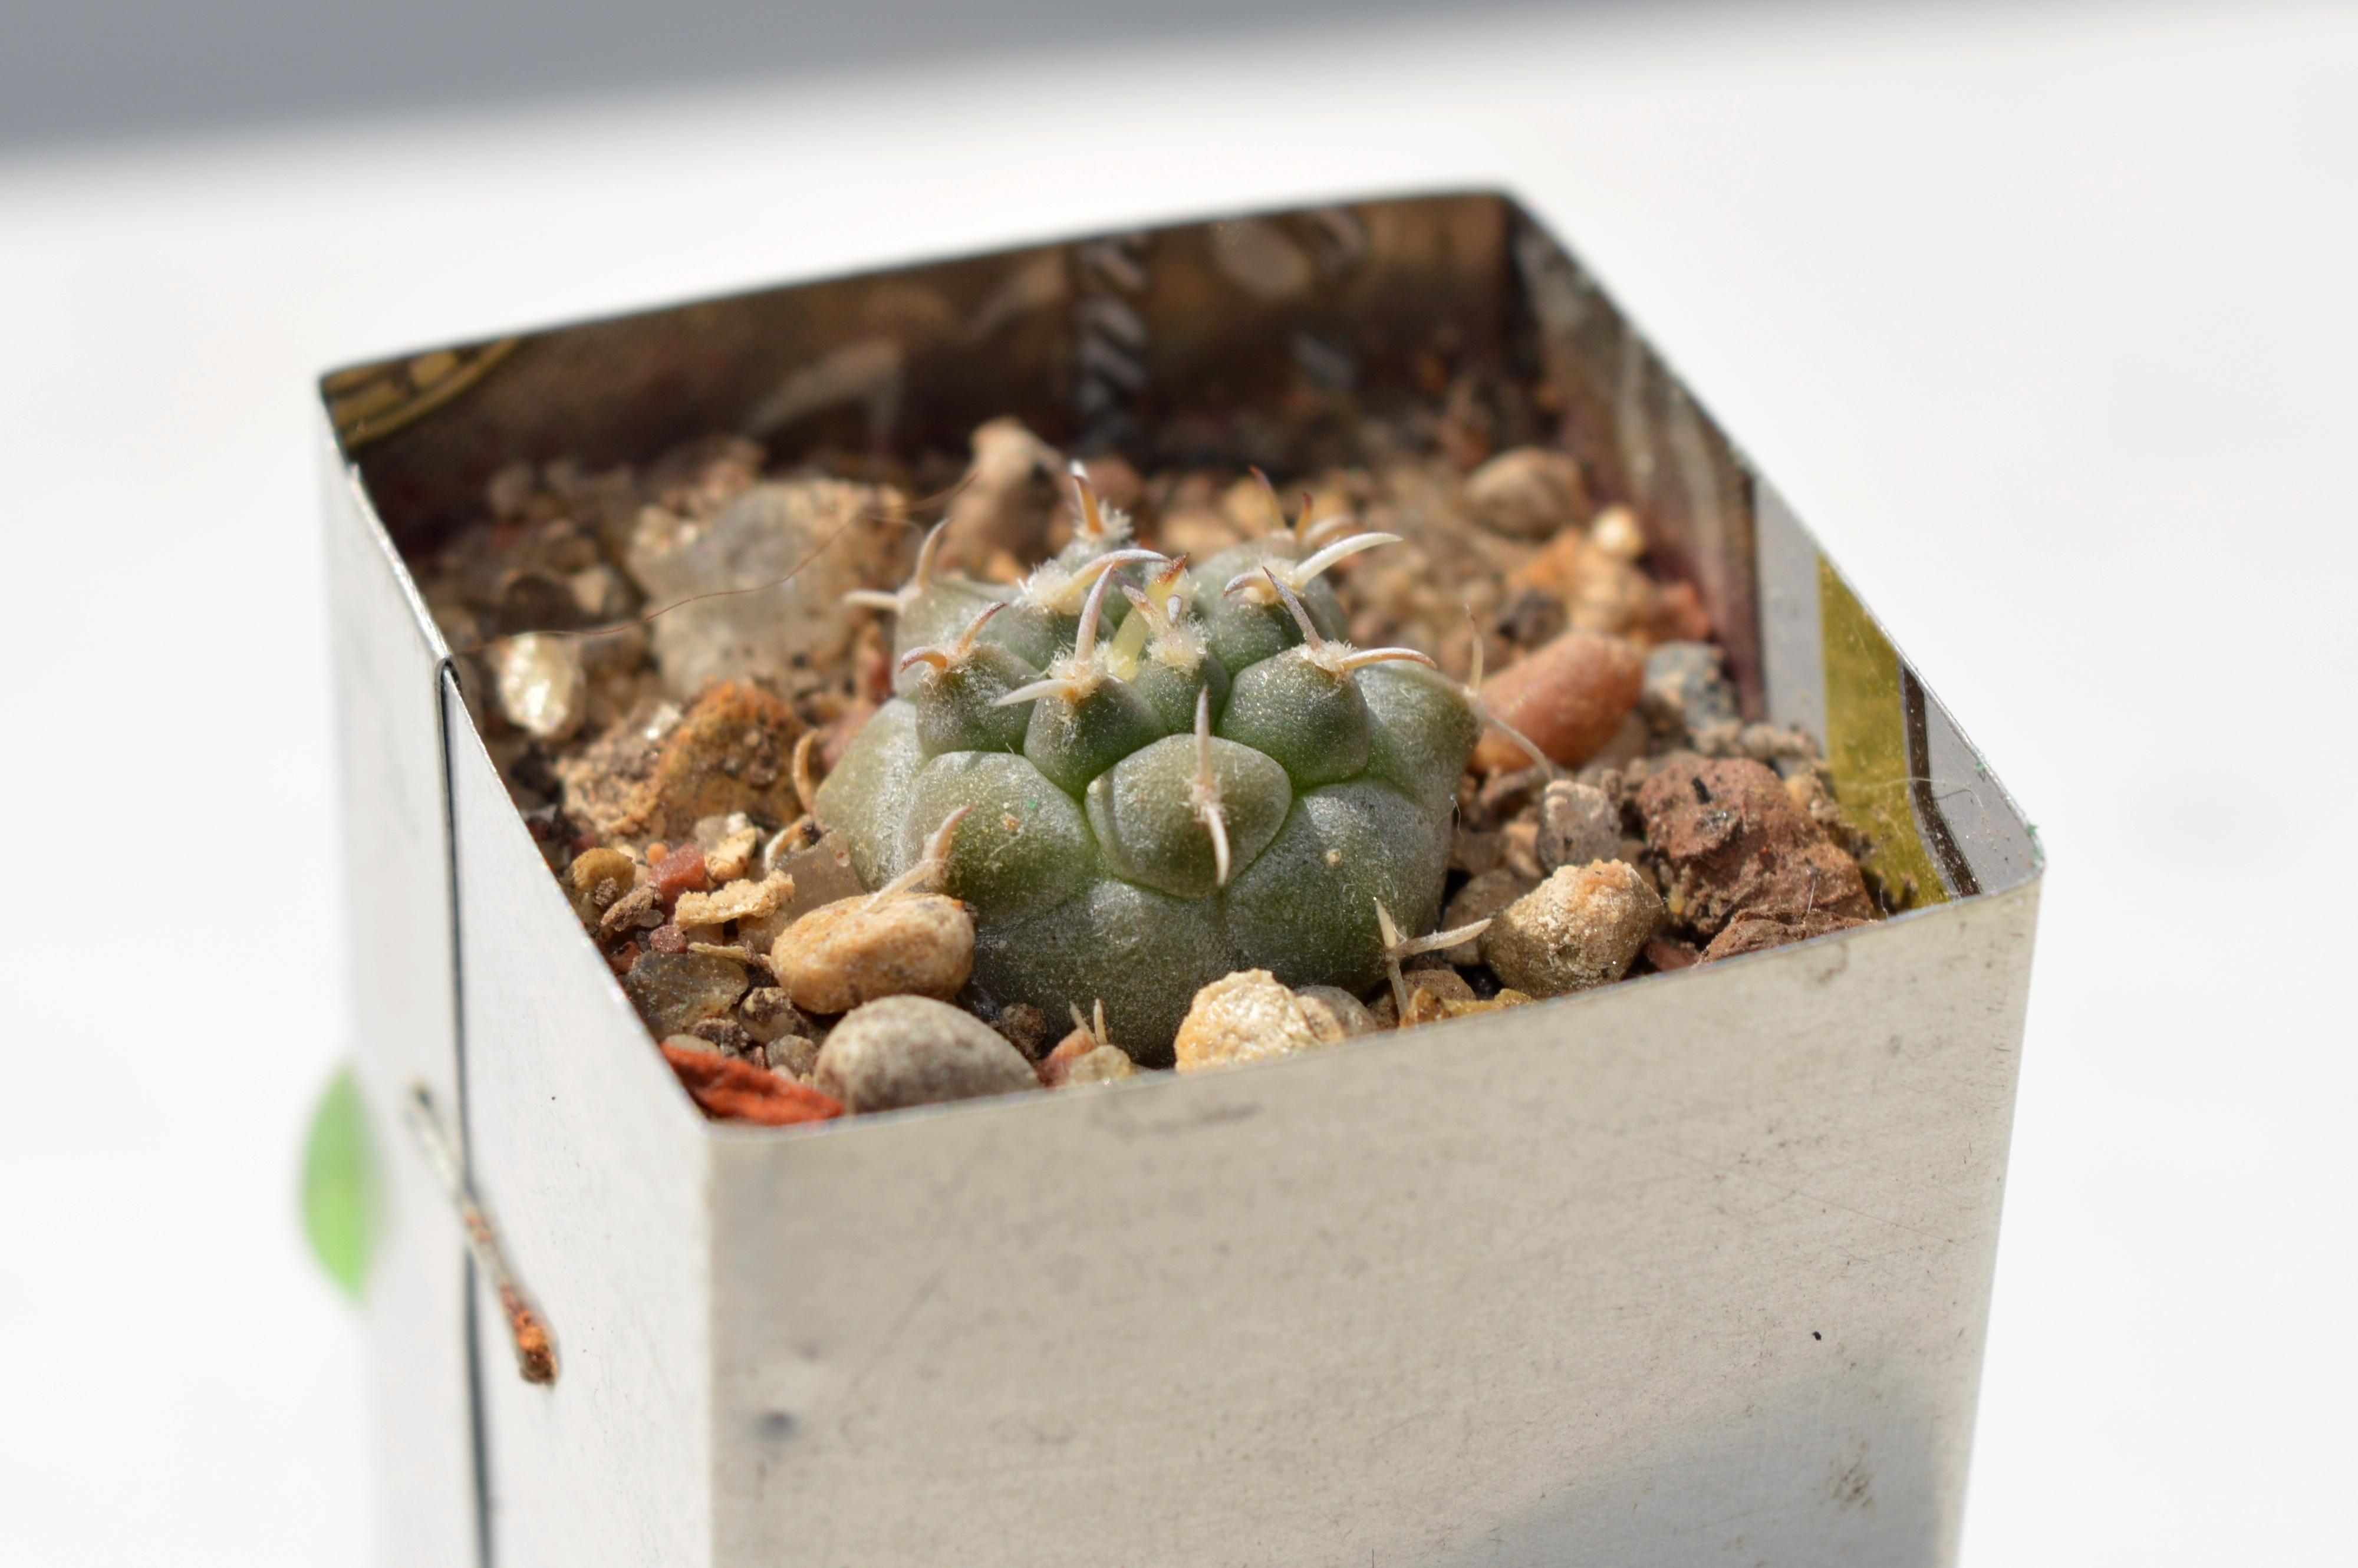 Free Images : cactus, green, collection, succulent, closeup, flora ...